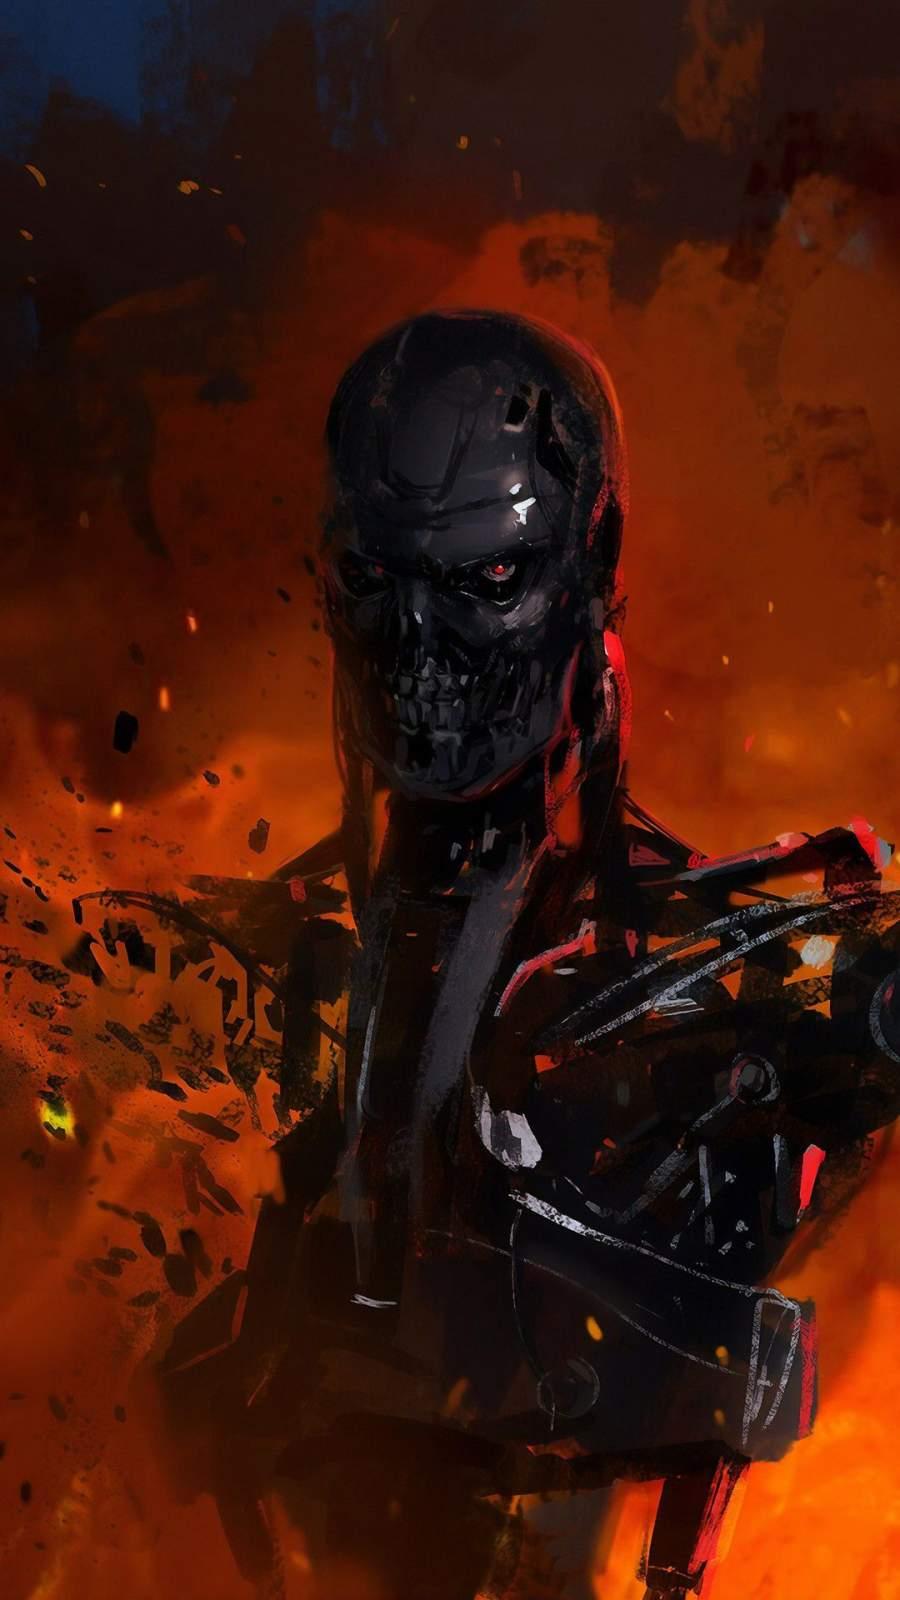 Terminator Art iPhone Wallpaper